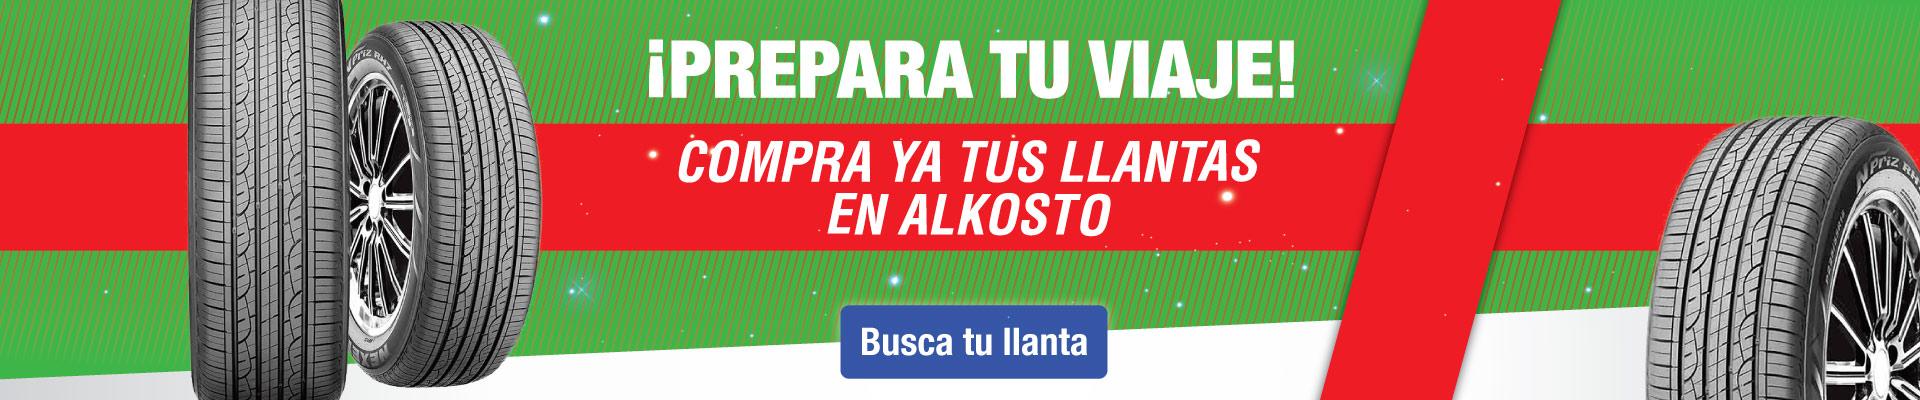 PPAL-AK-13-Llantas-Busca-tu-llanta-Dic2-20